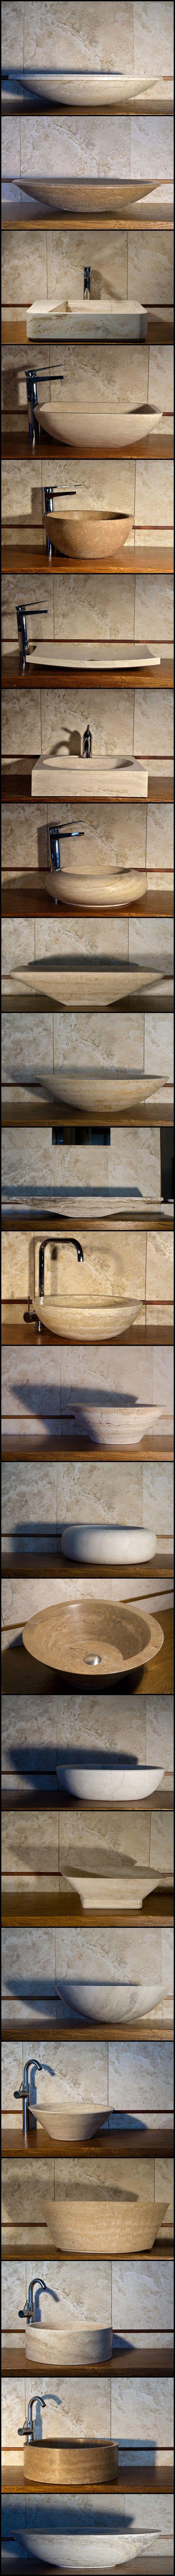 SInks, sinks, sinks!!    Travertine sinks by Pietre di Rapolano    #lavabo #sink #pietrerapolano